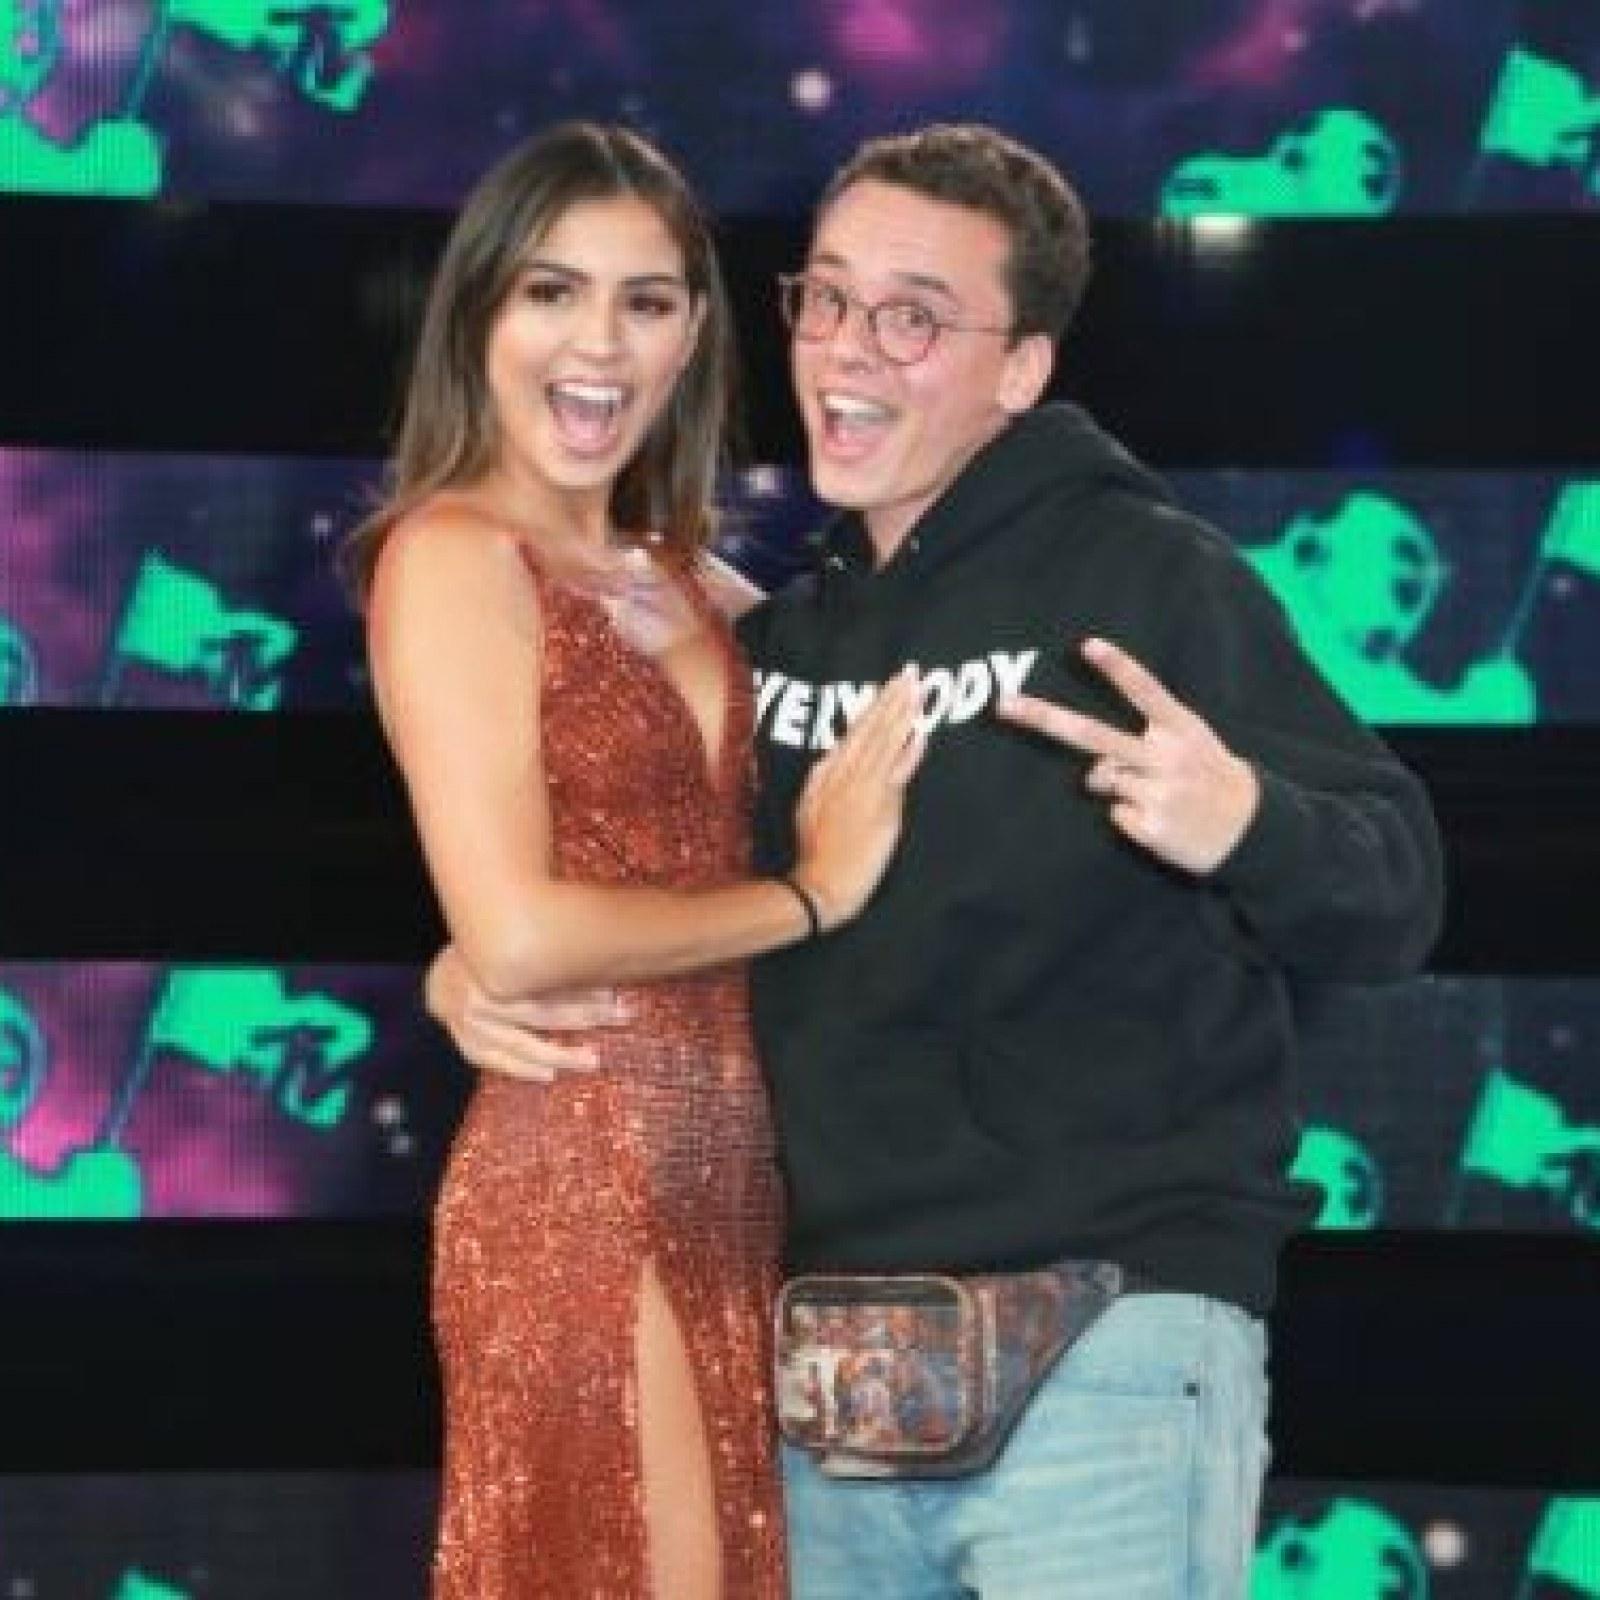 Logic S Wife Jessica Andrea Deletes Her Instagram After Rumored Split